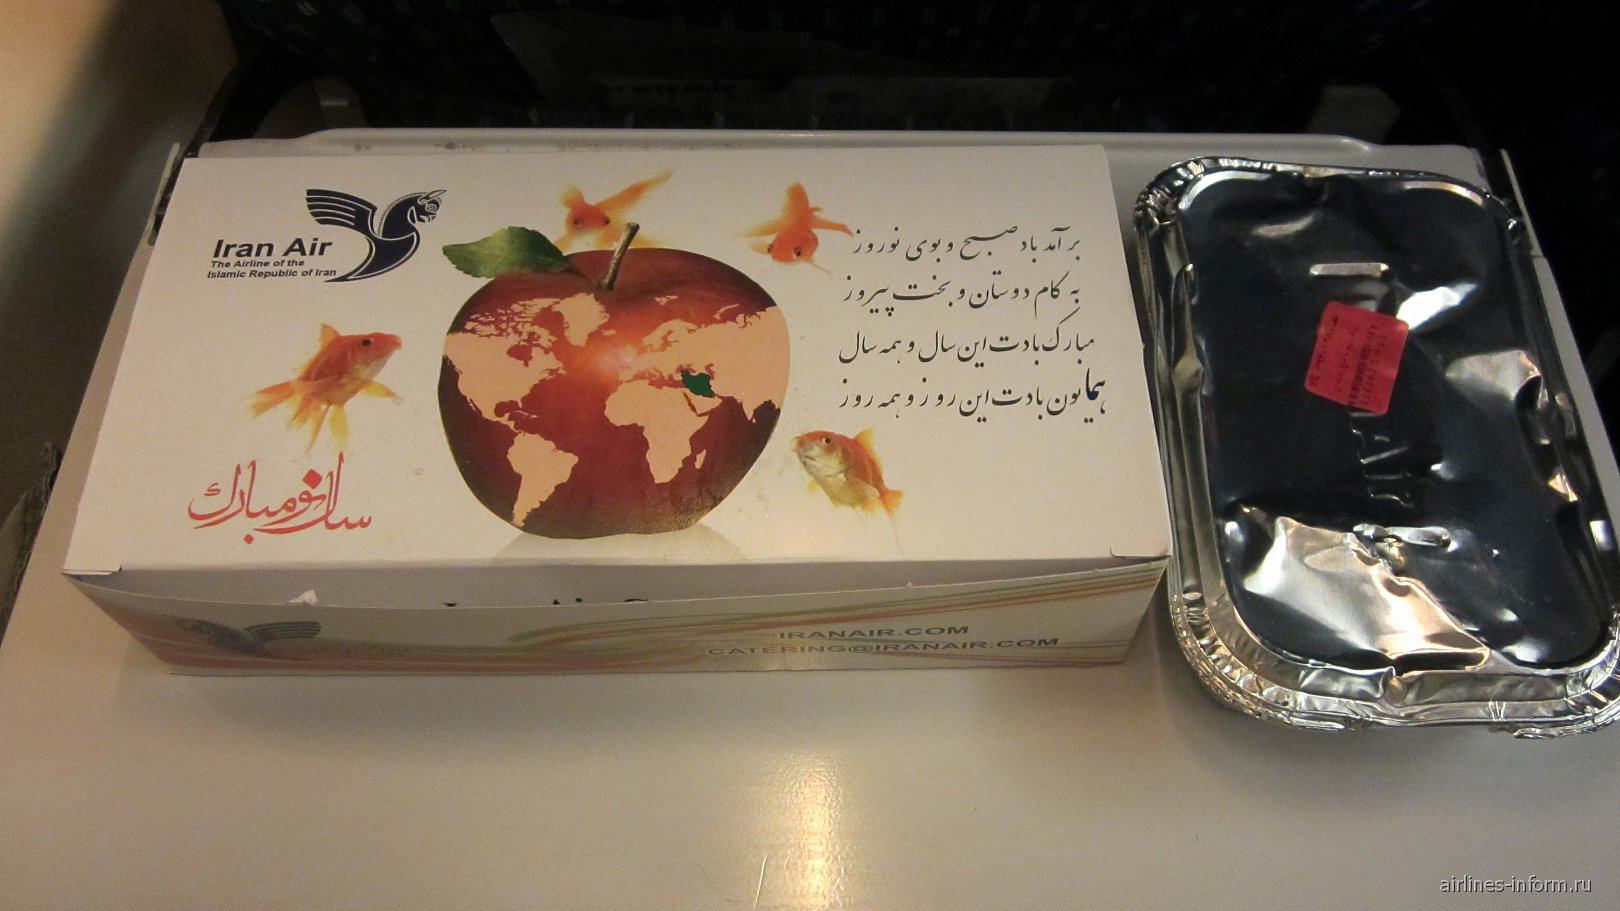 Питание на рейсе Тегеран-Шираз авиакомпании Iran Air